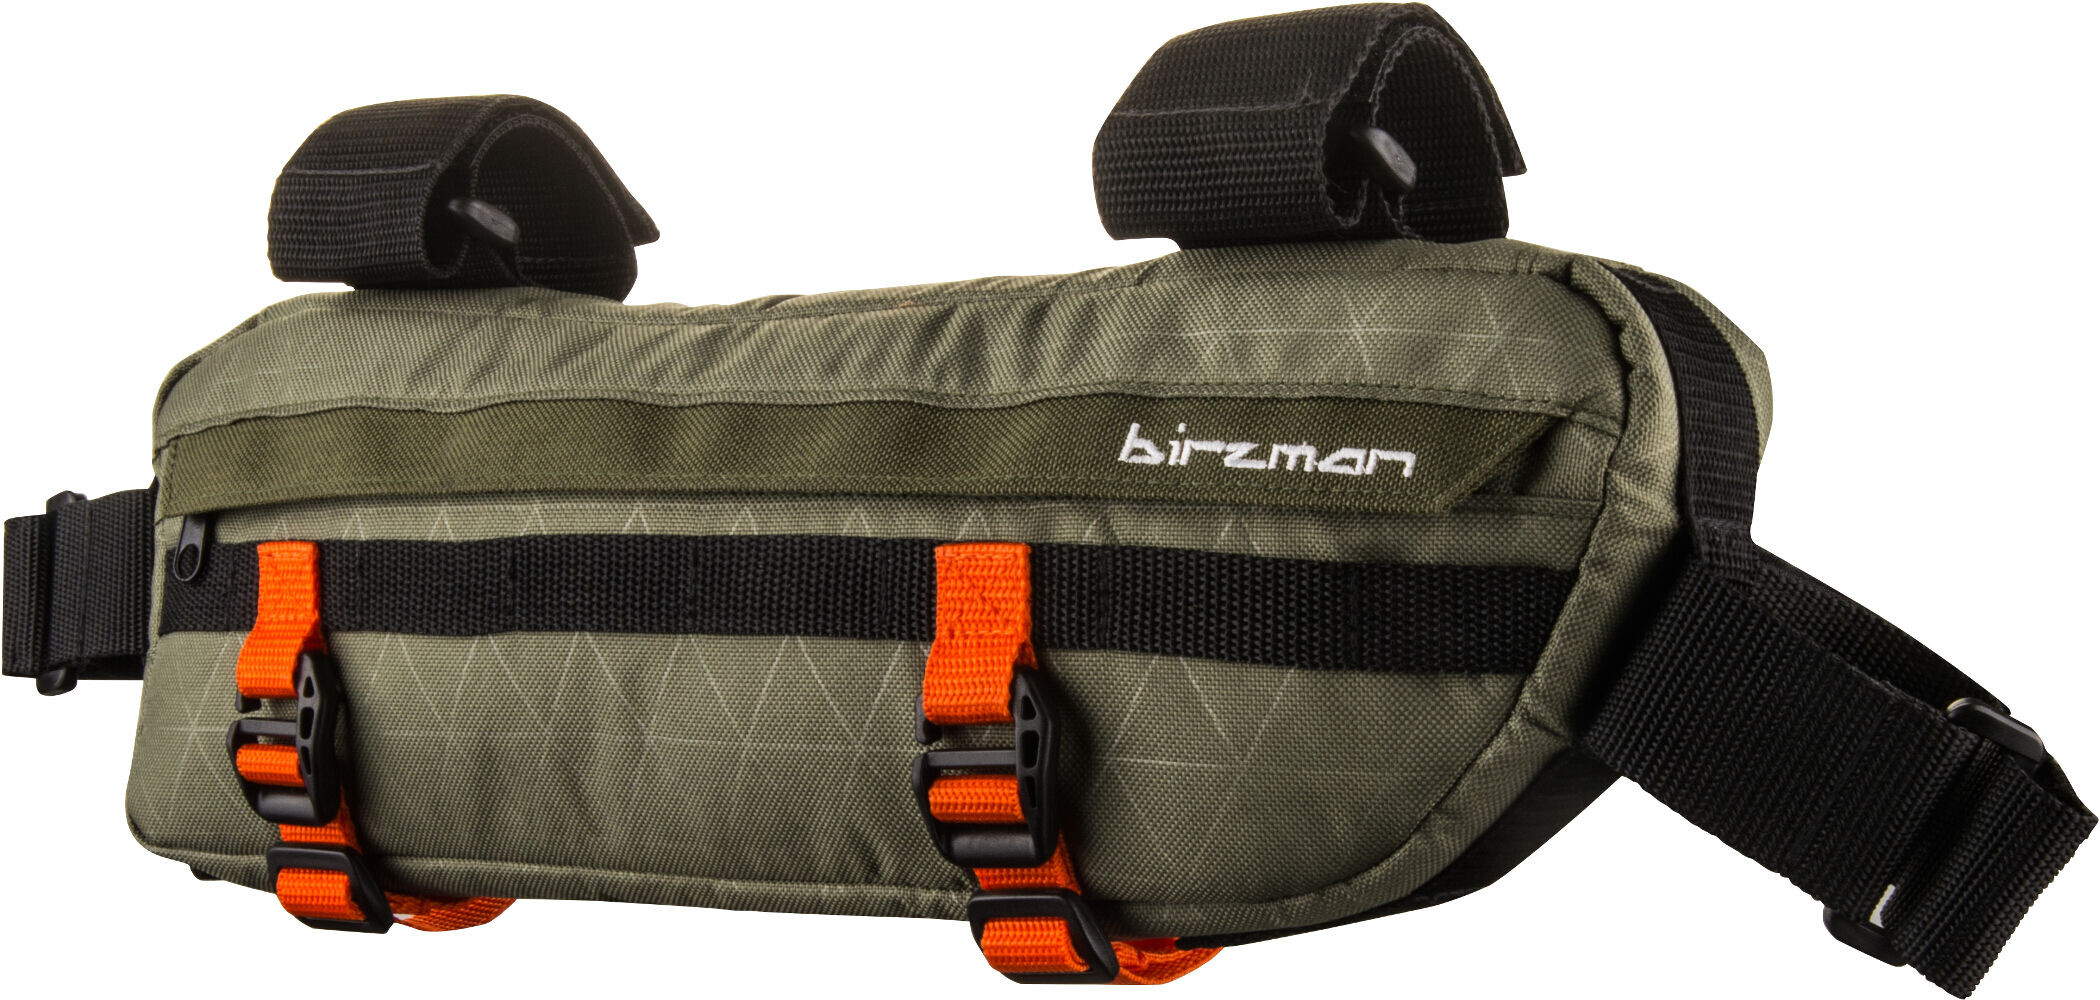 Birzman Packman Travel Planet Frame Pack olive online kaufen ...